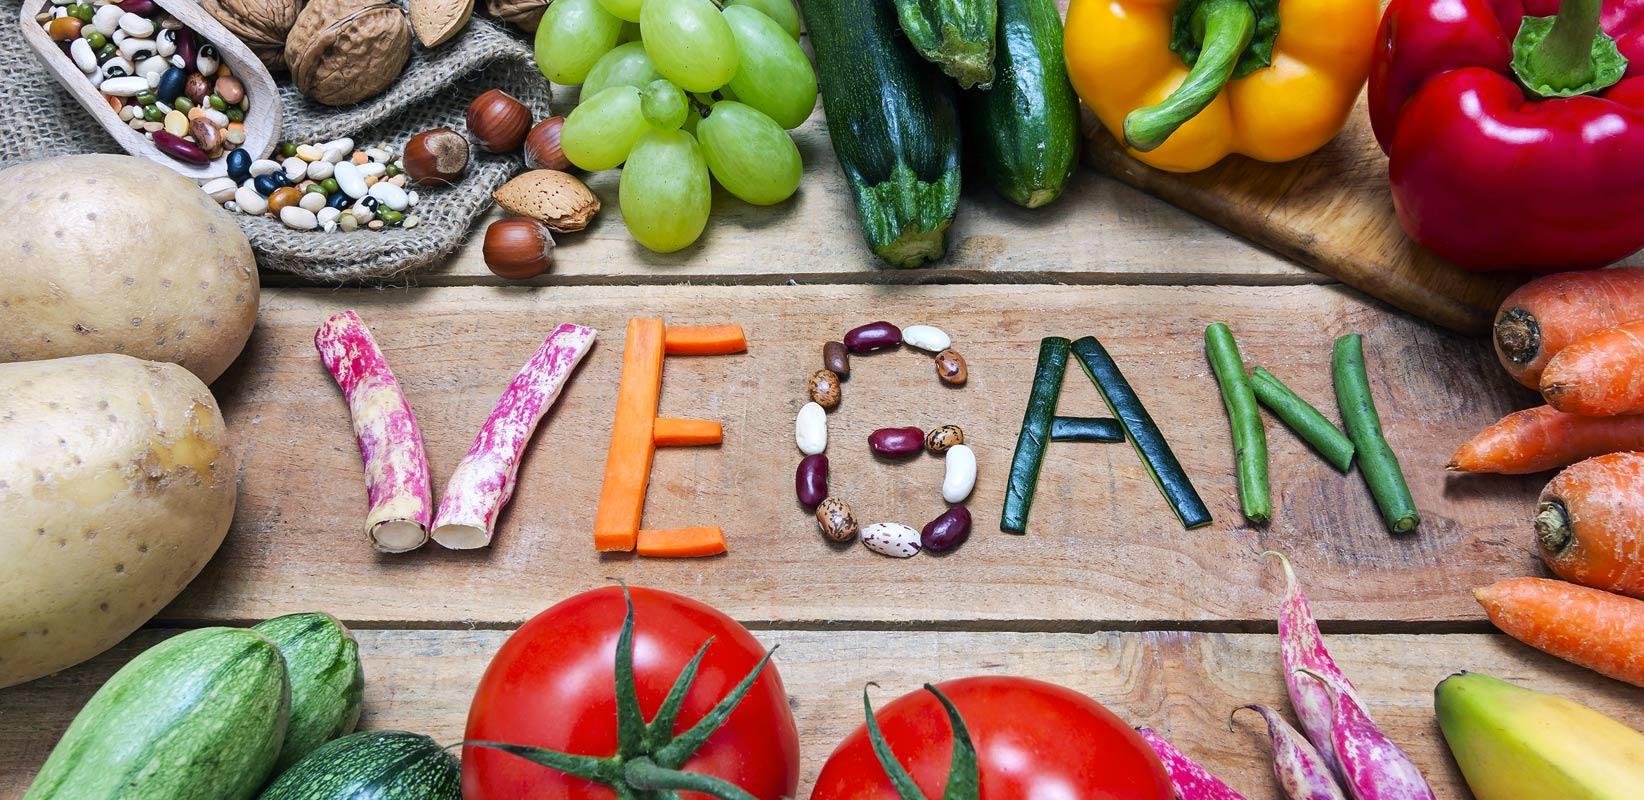 Régime végétalien & vegan